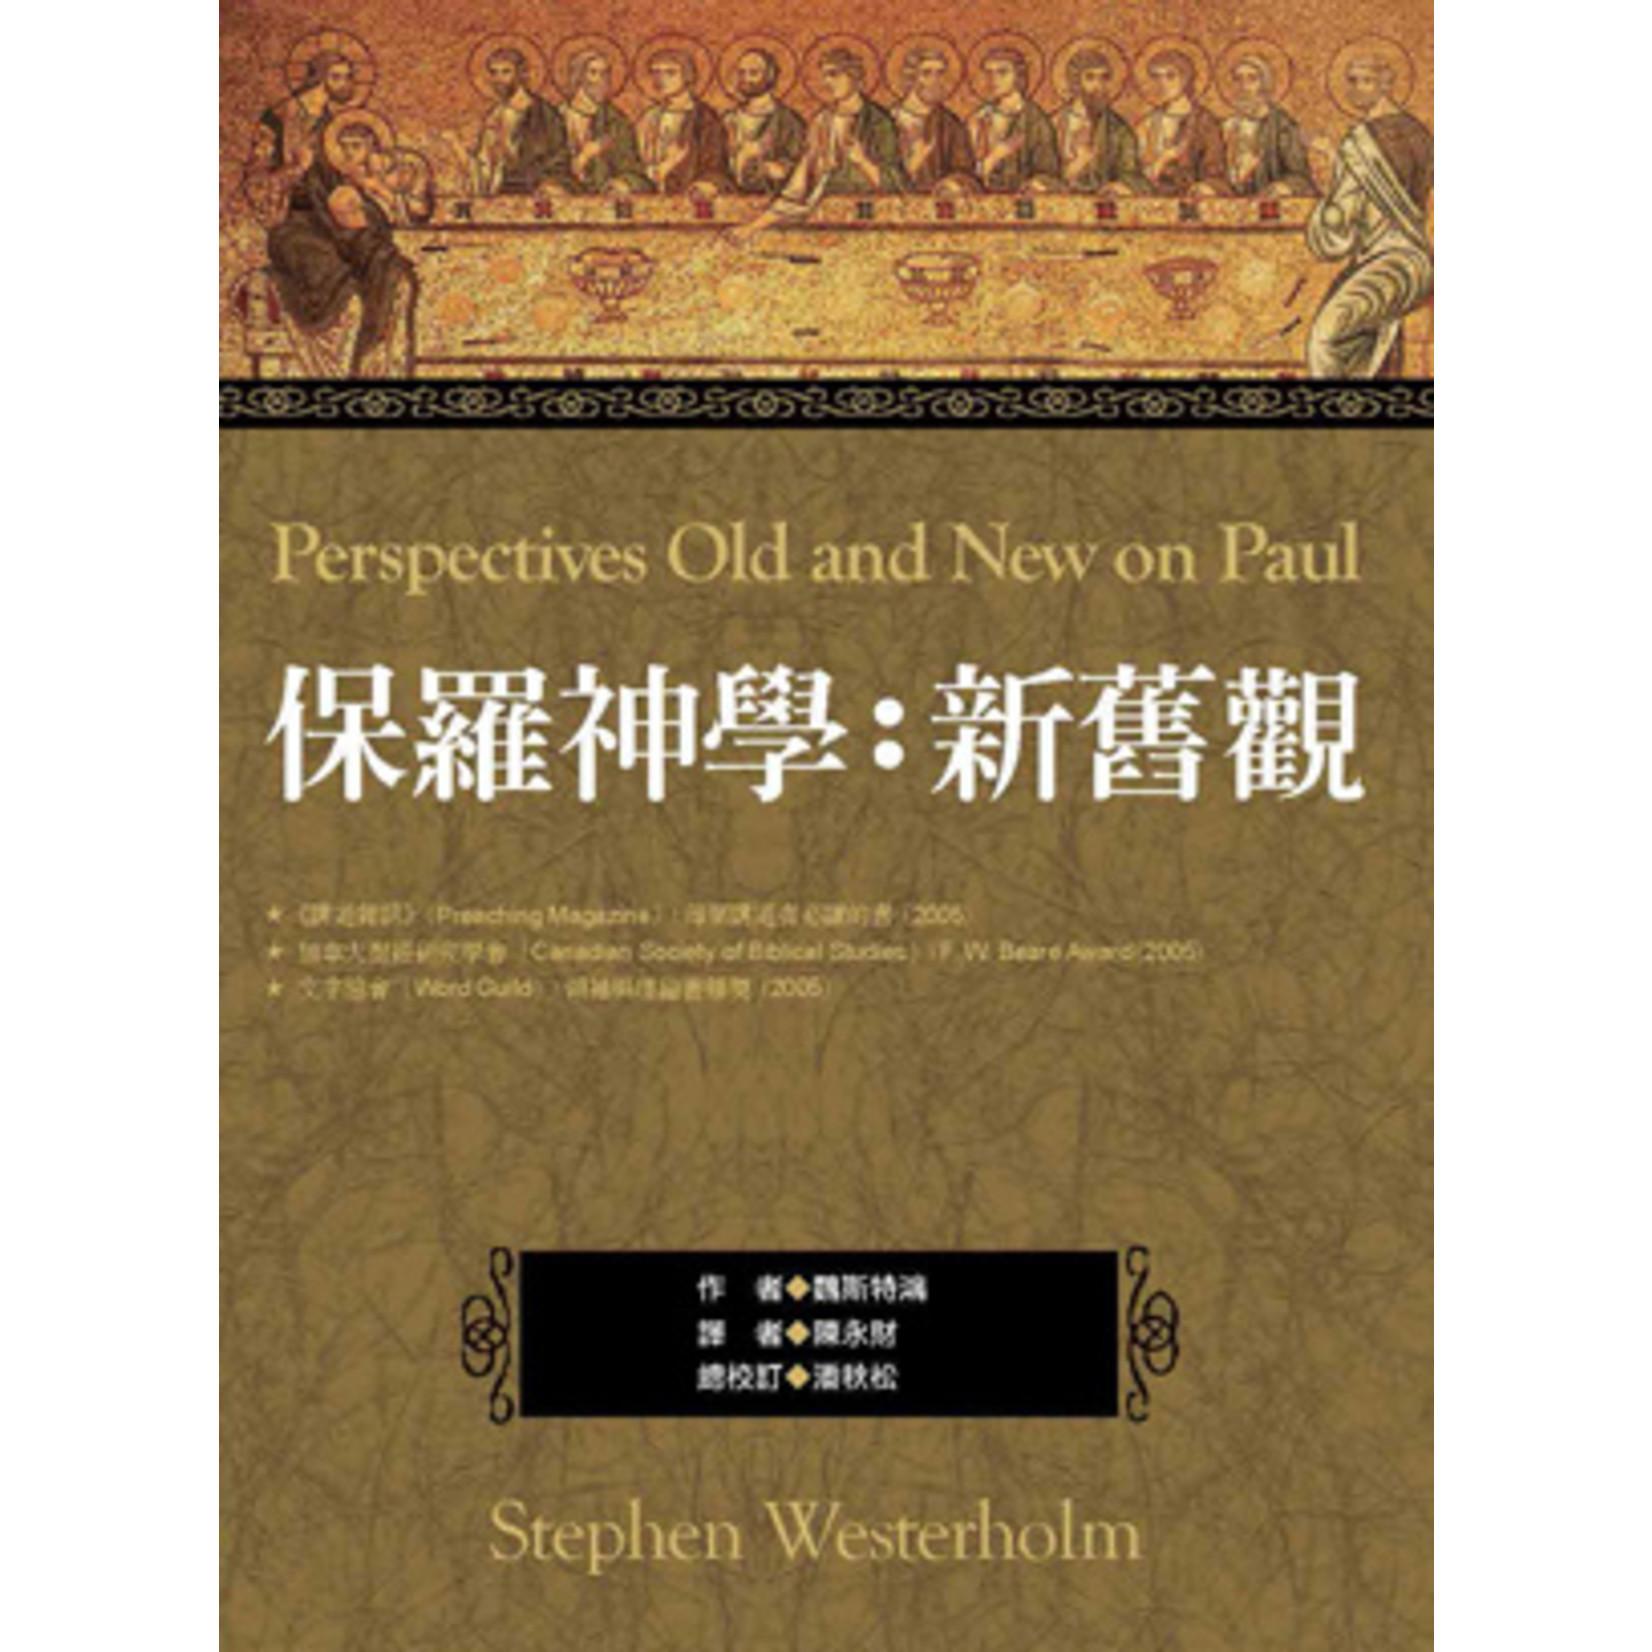 美國麥種傳道會 AKOWCM 保羅神學:新舊觀(繁體) Perspectives Old and New on Paul